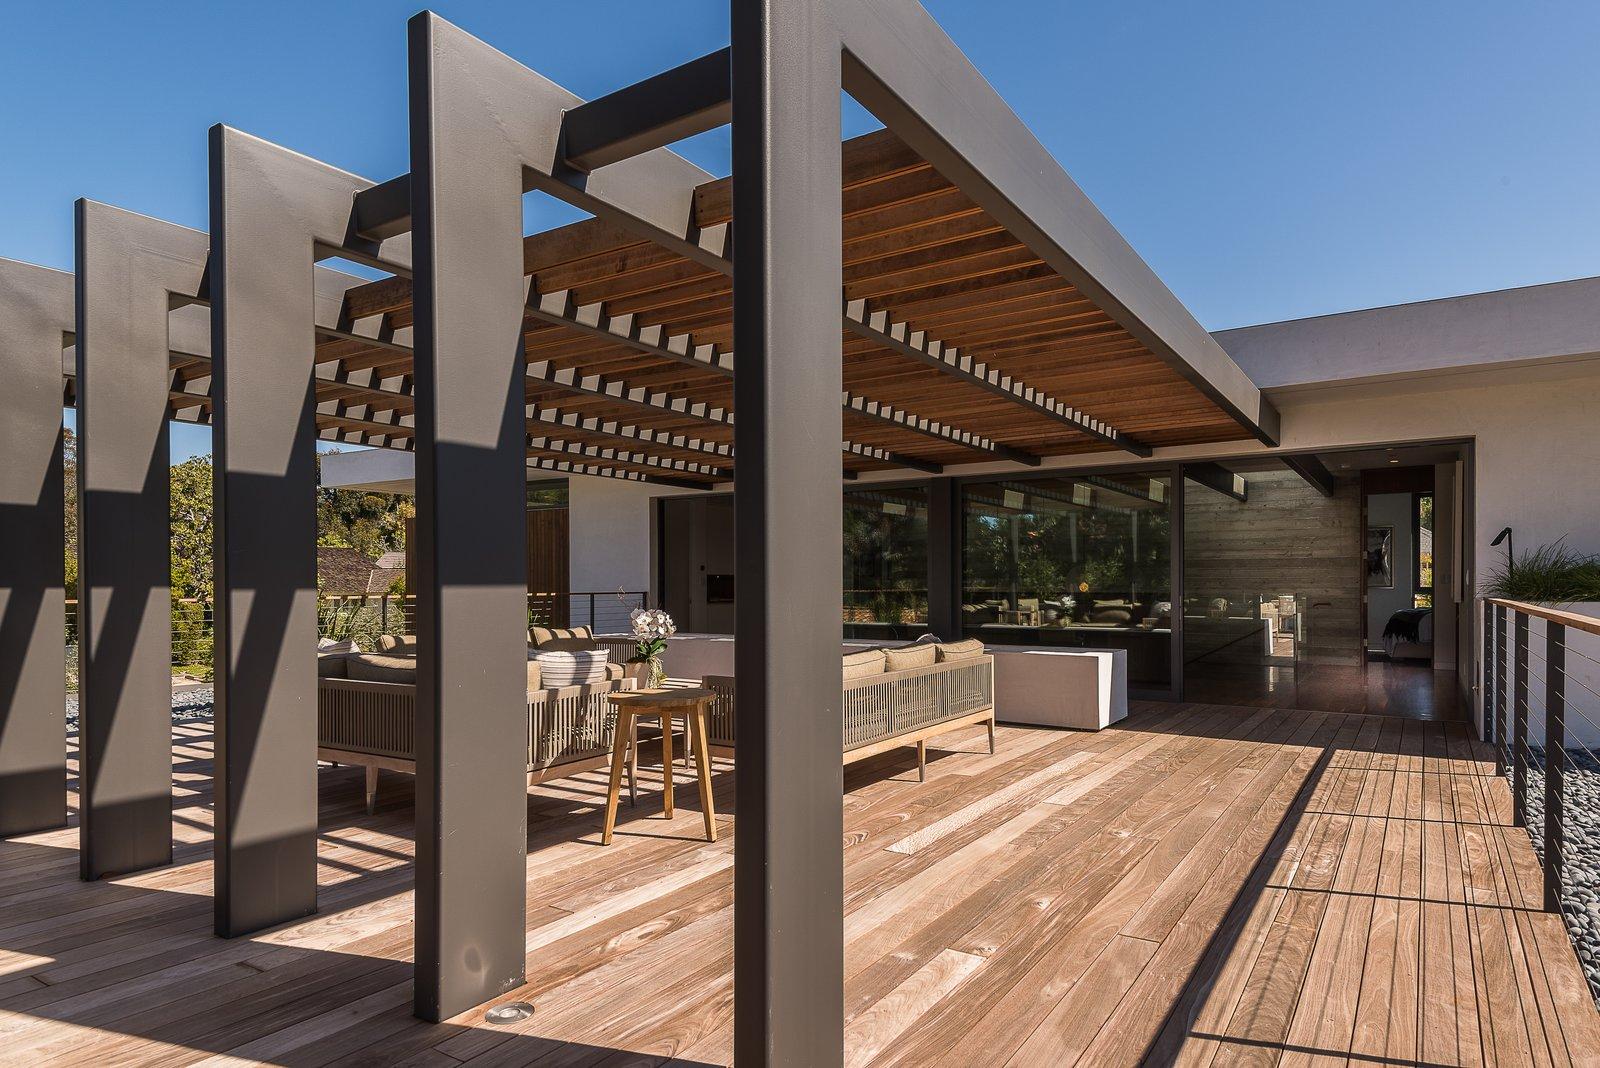 Roof Terrace Amalfi Drive Residence by Daryl Olesinski